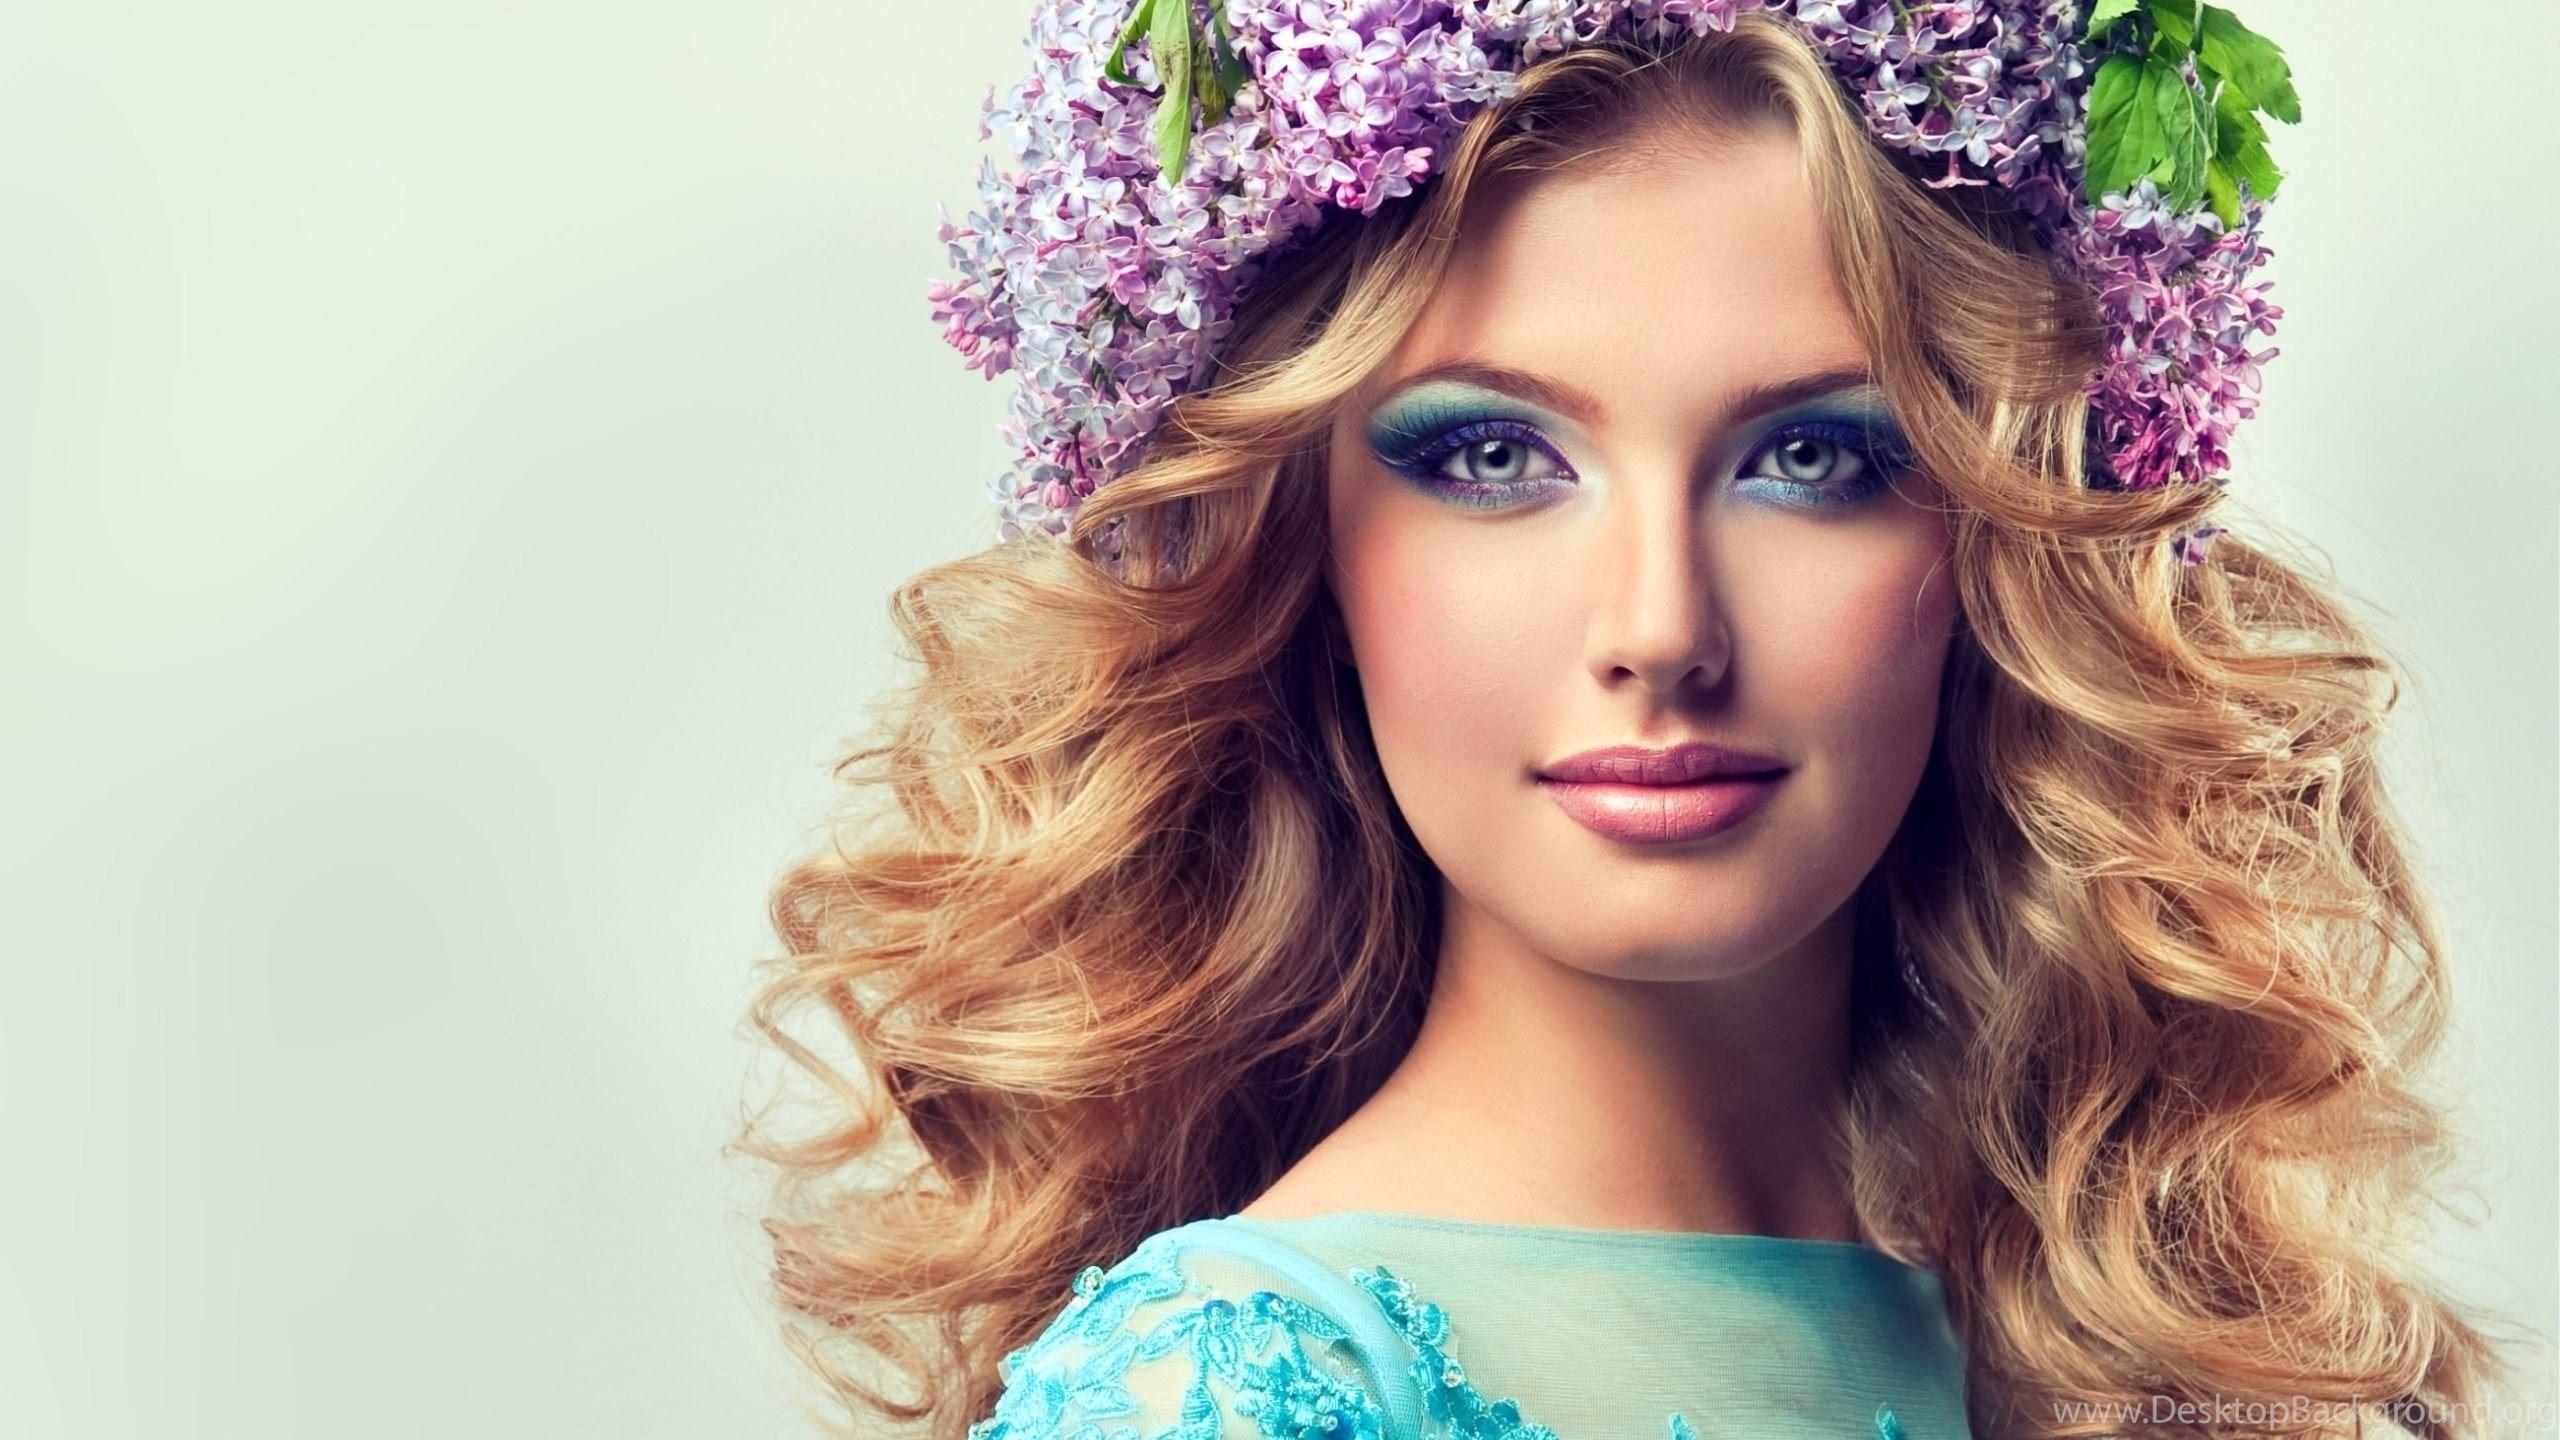 Hair flowers of beautiful girl wallpapers hd for desktop mobile netbook izmirmasajfo